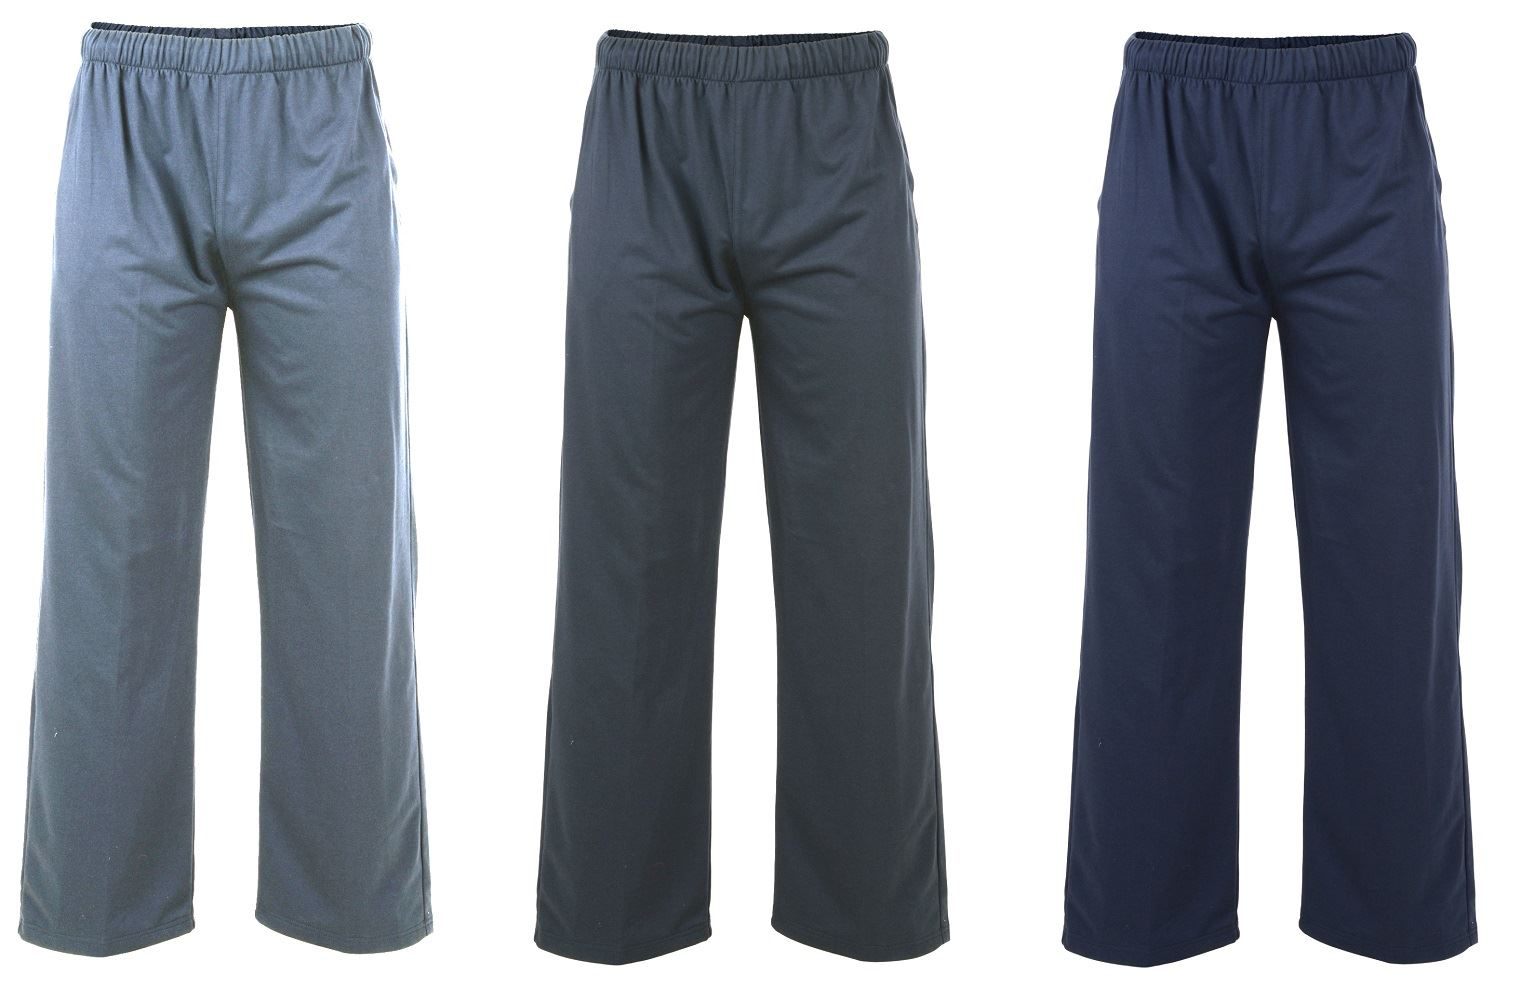 Jeans PLEASE Donna P83ABQ2HC vita bassa 3 Bottoni slim fit spacco alle caviglie